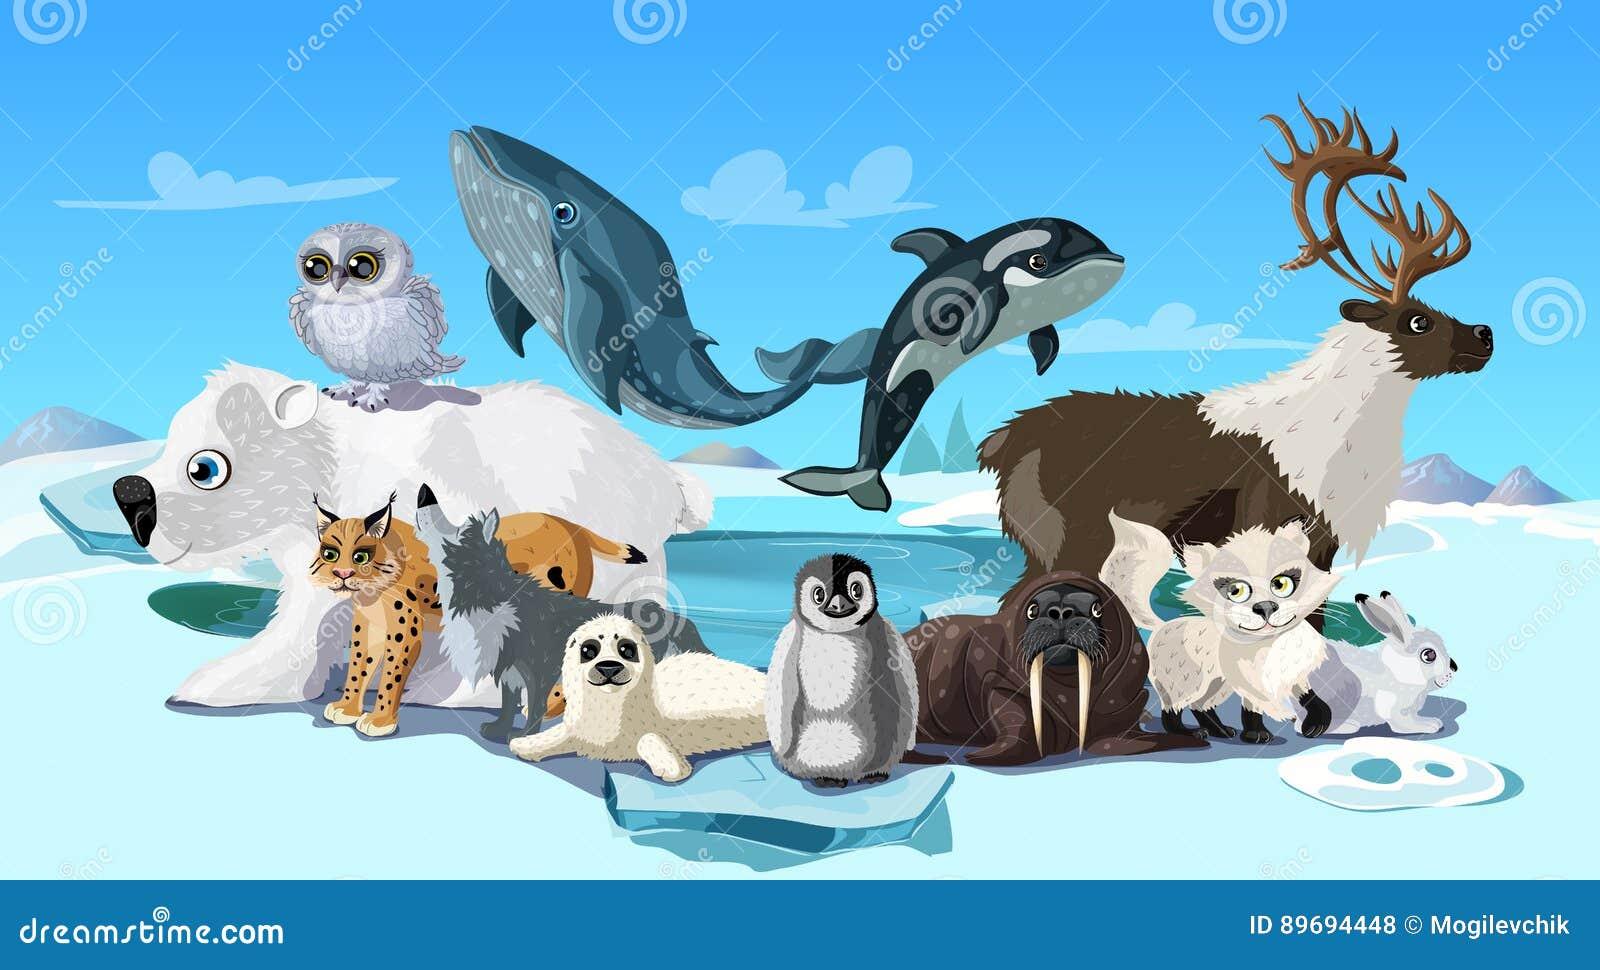 Arctic Animals Cartoon Template Vector Illustration